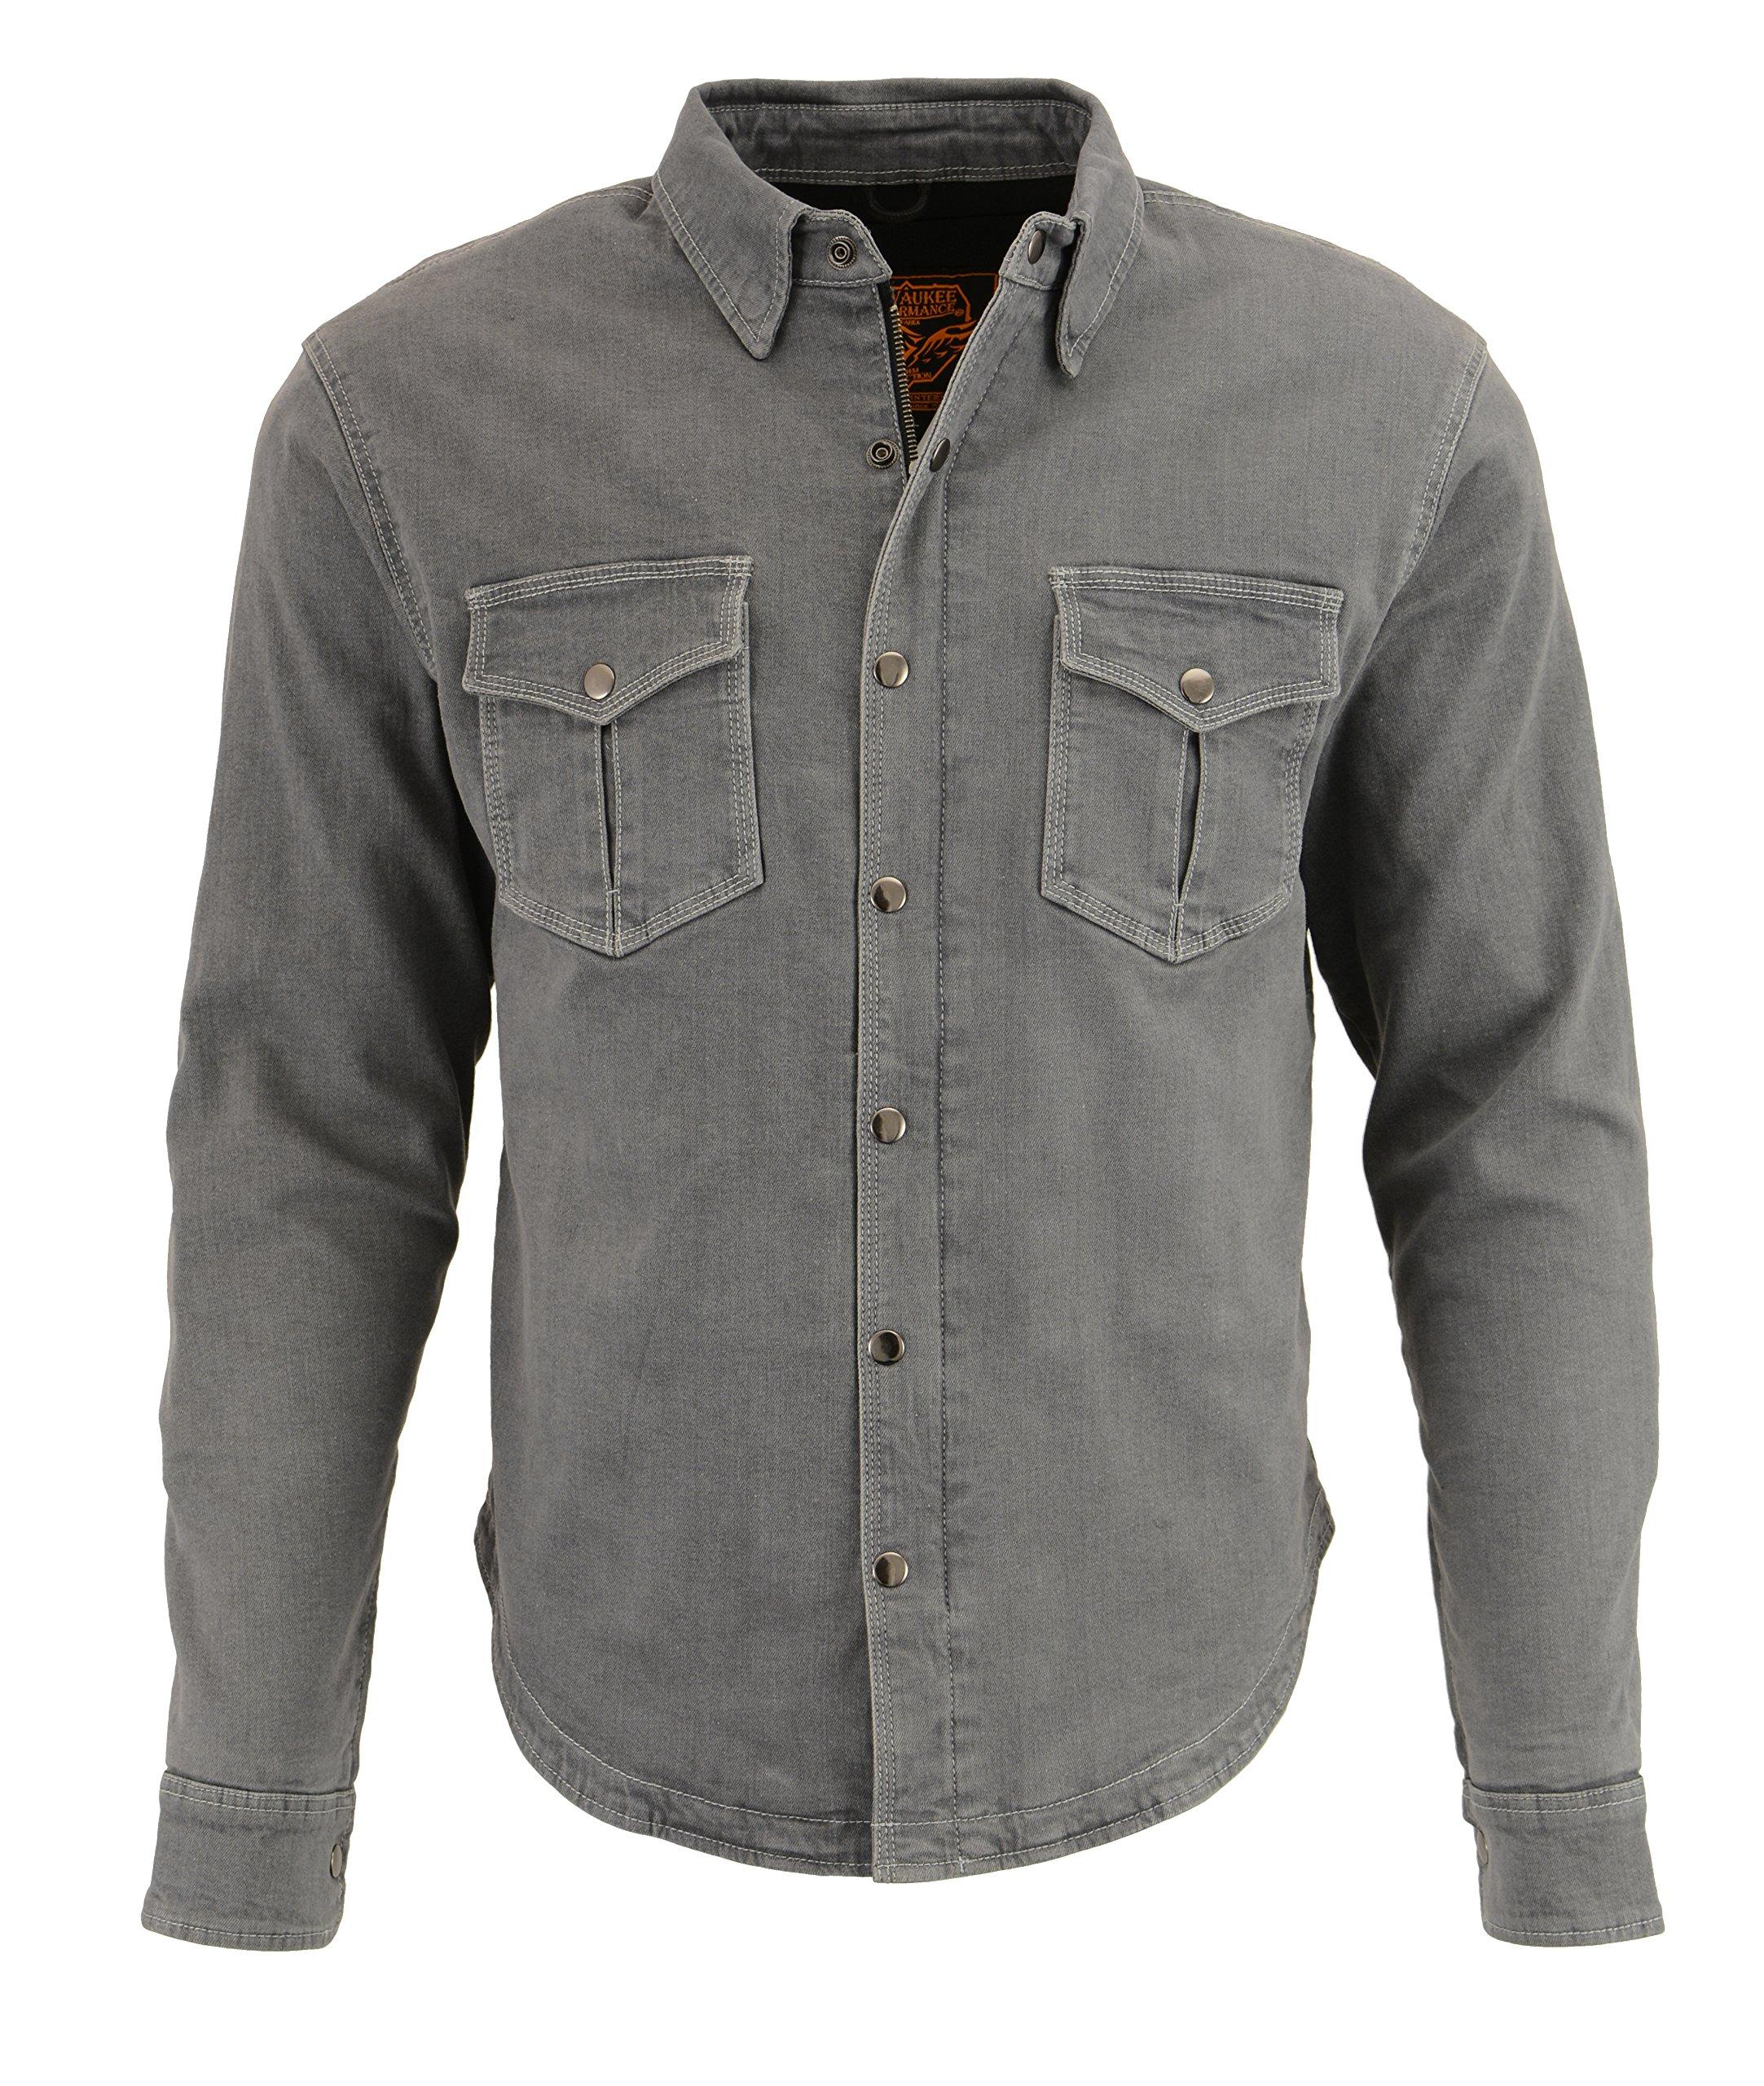 Milwaukee Performance Men's Denim Biker Shirt With Aramid (Grey, 4X-Large)